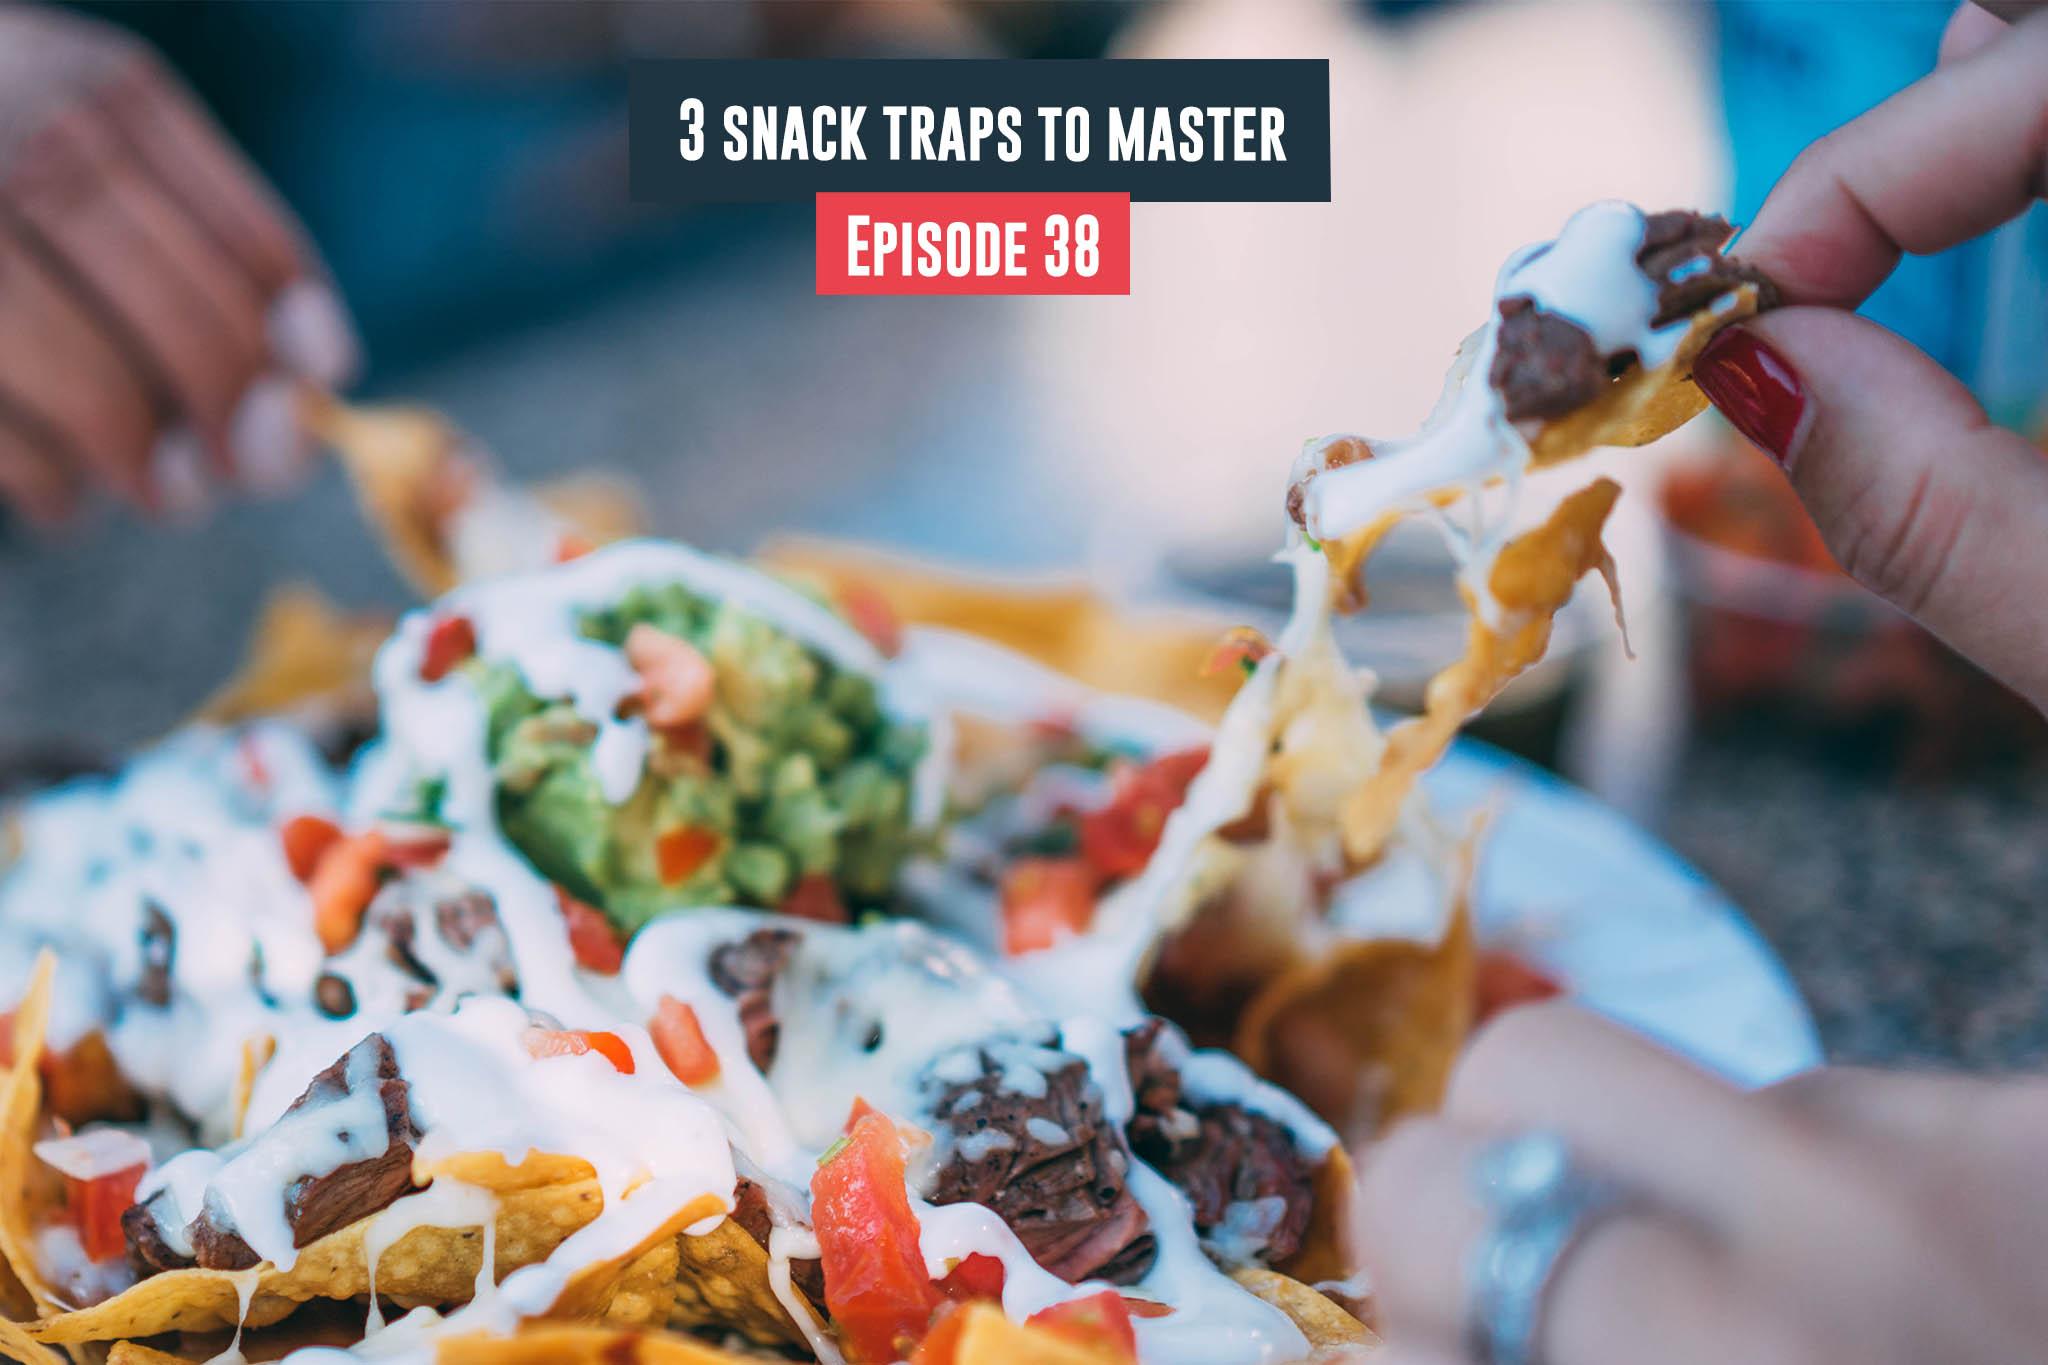 snack traps to master